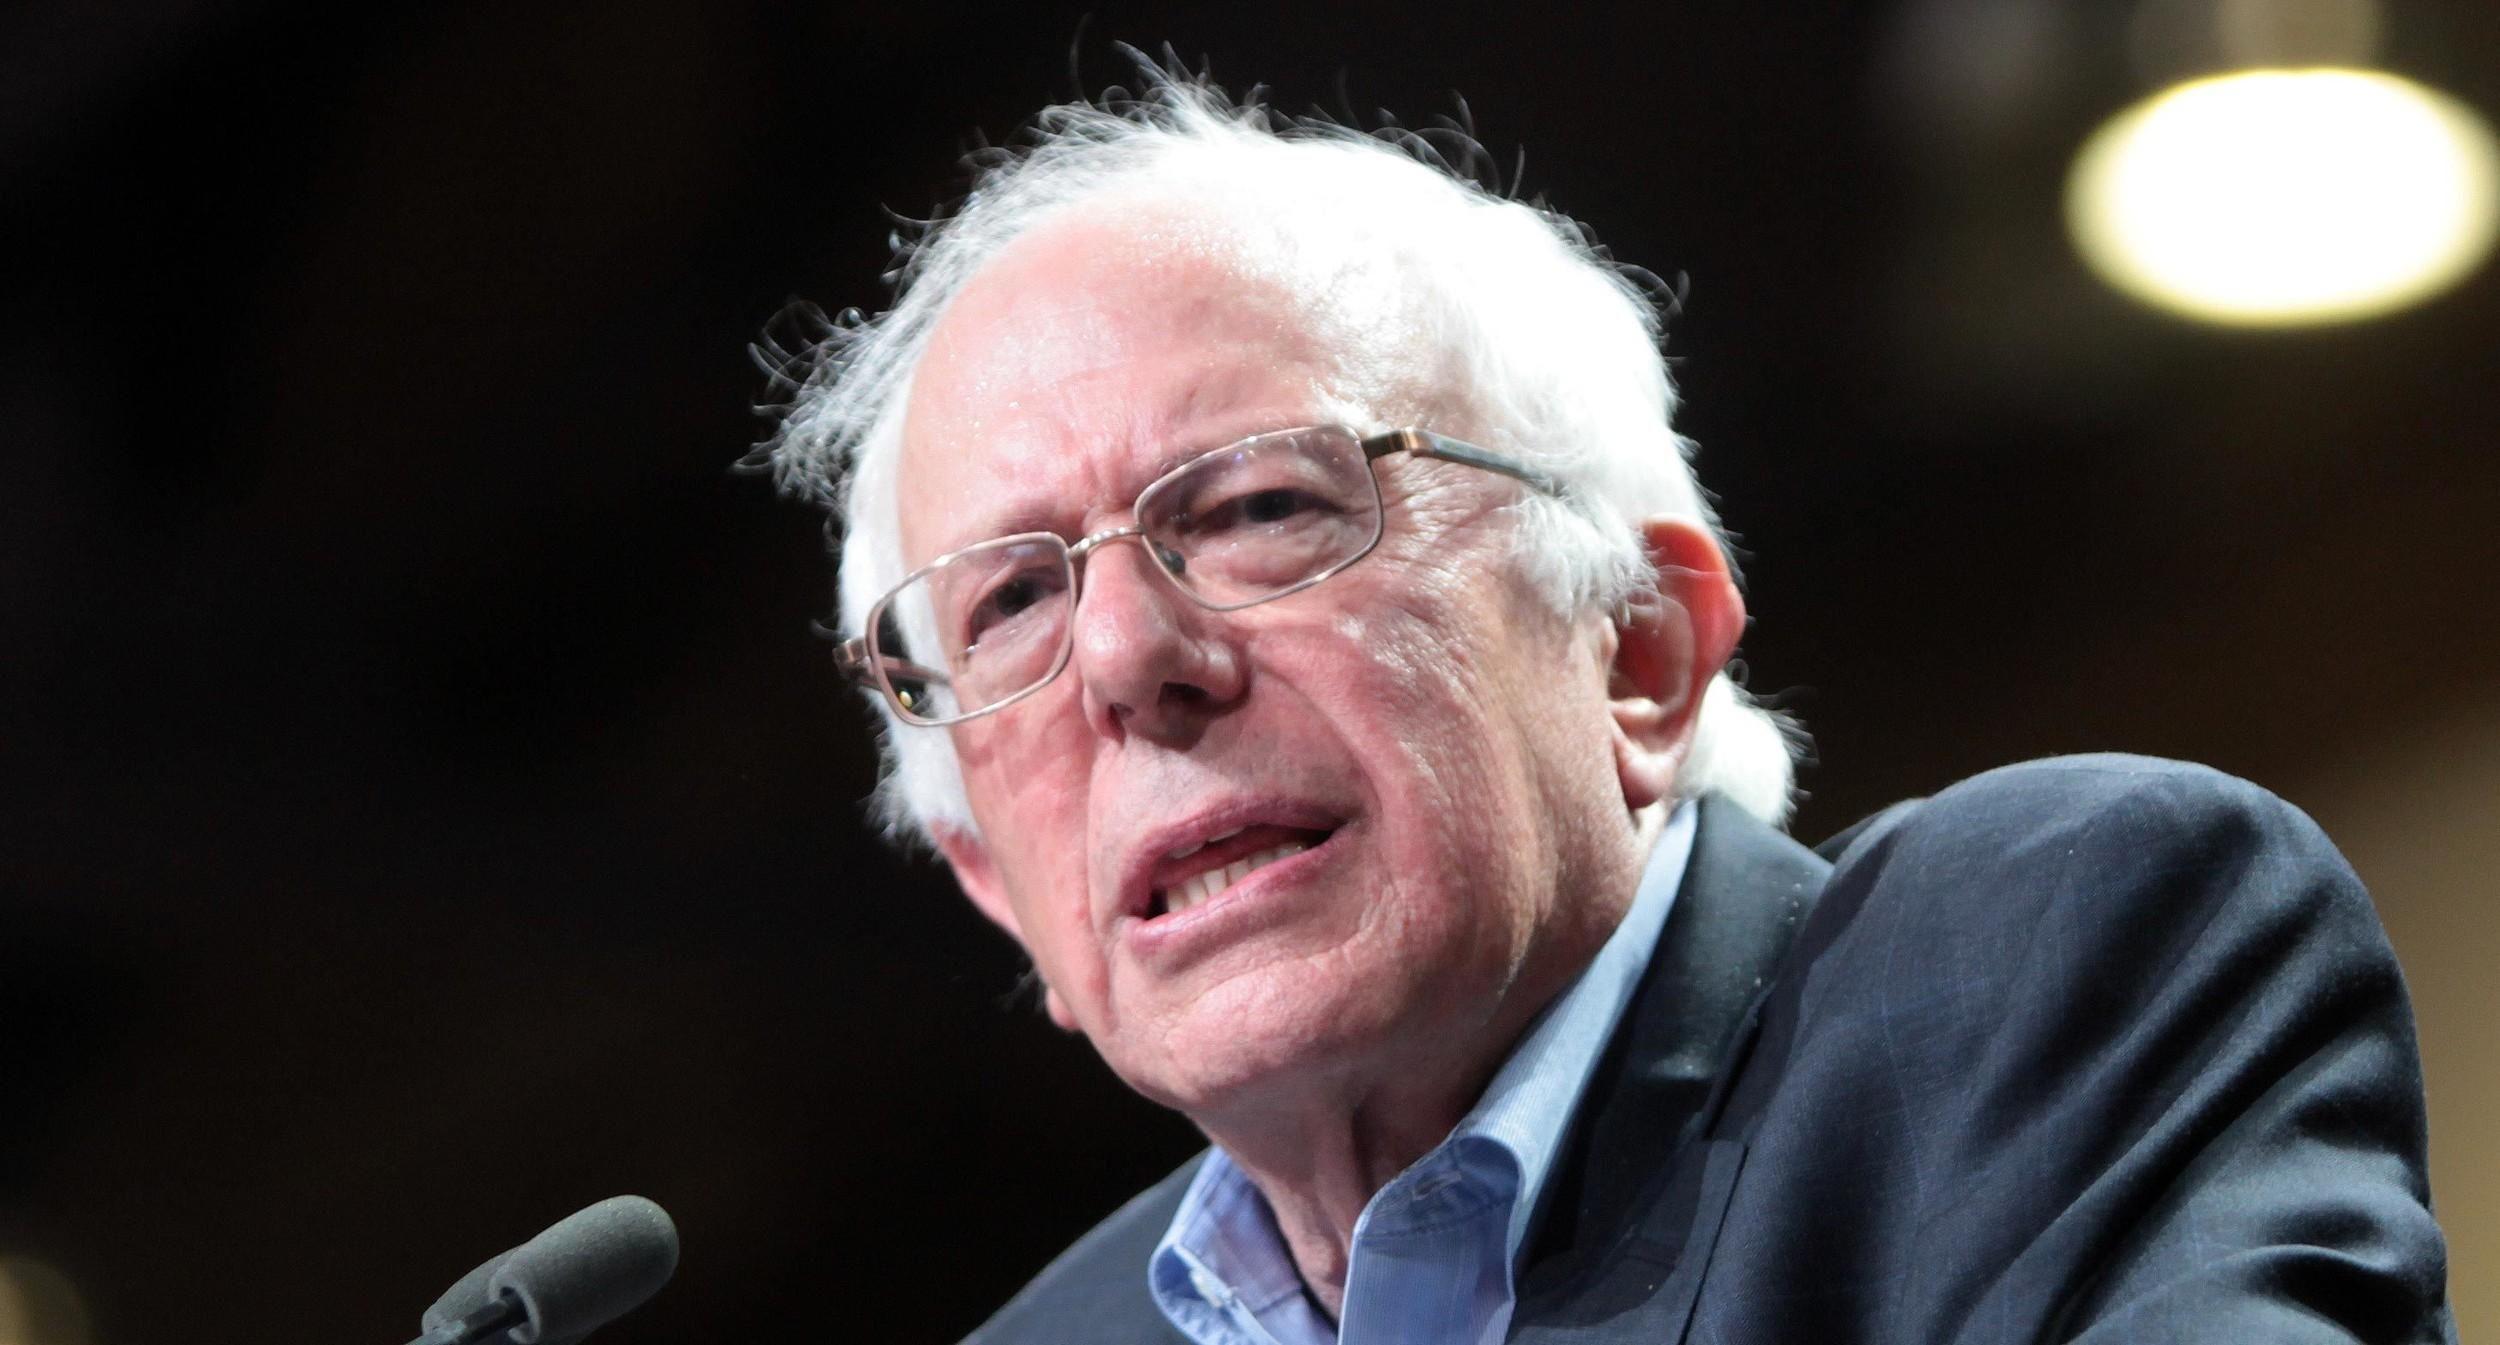 Bernie Sanders Will Co-Sponsor Federal Cannabis Legalization Bill